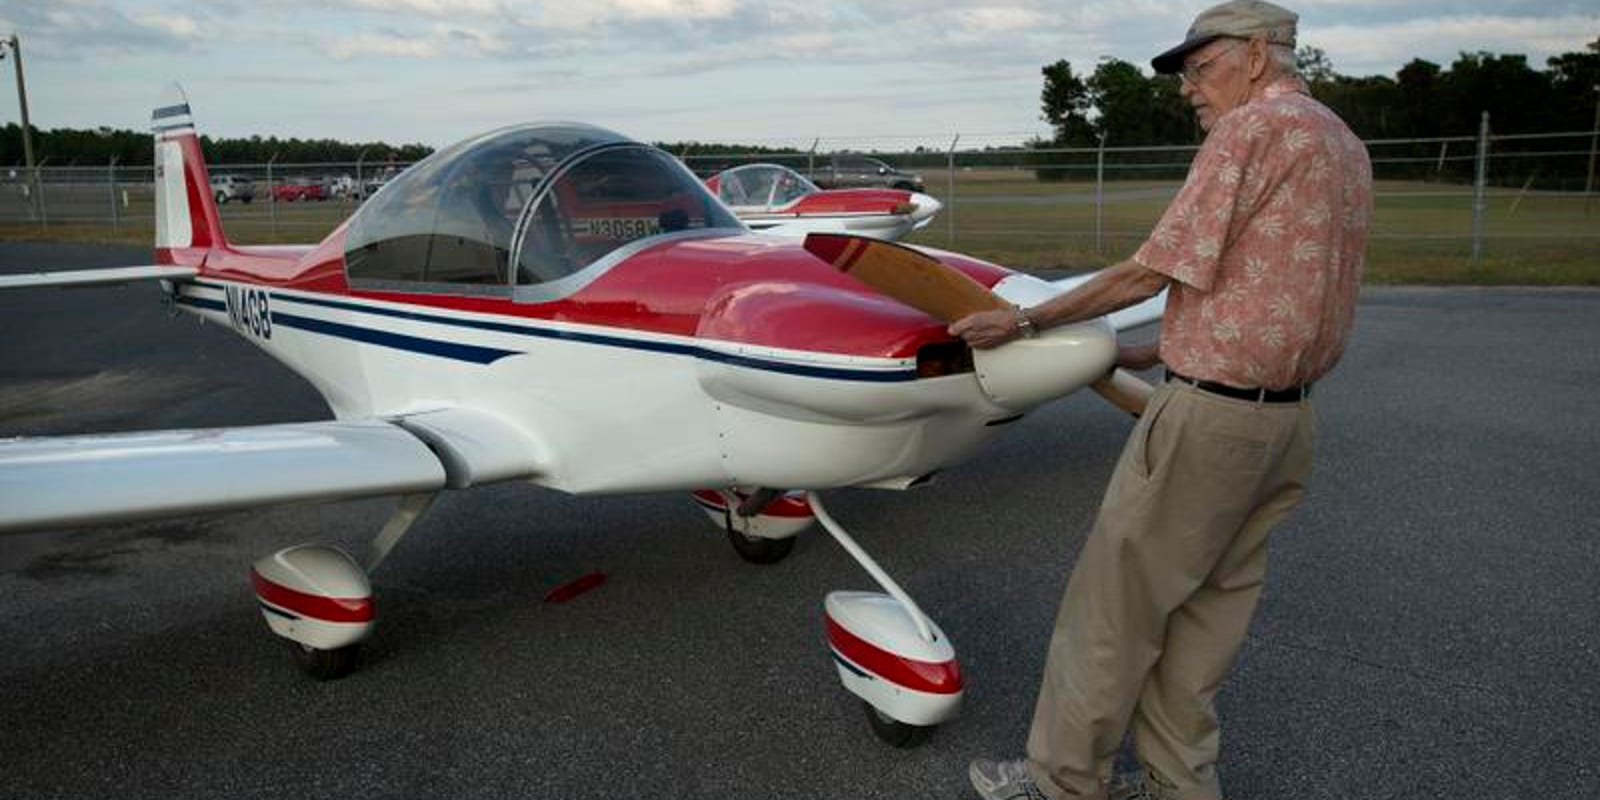 Pensacola aircraft designer's experimental plane soars